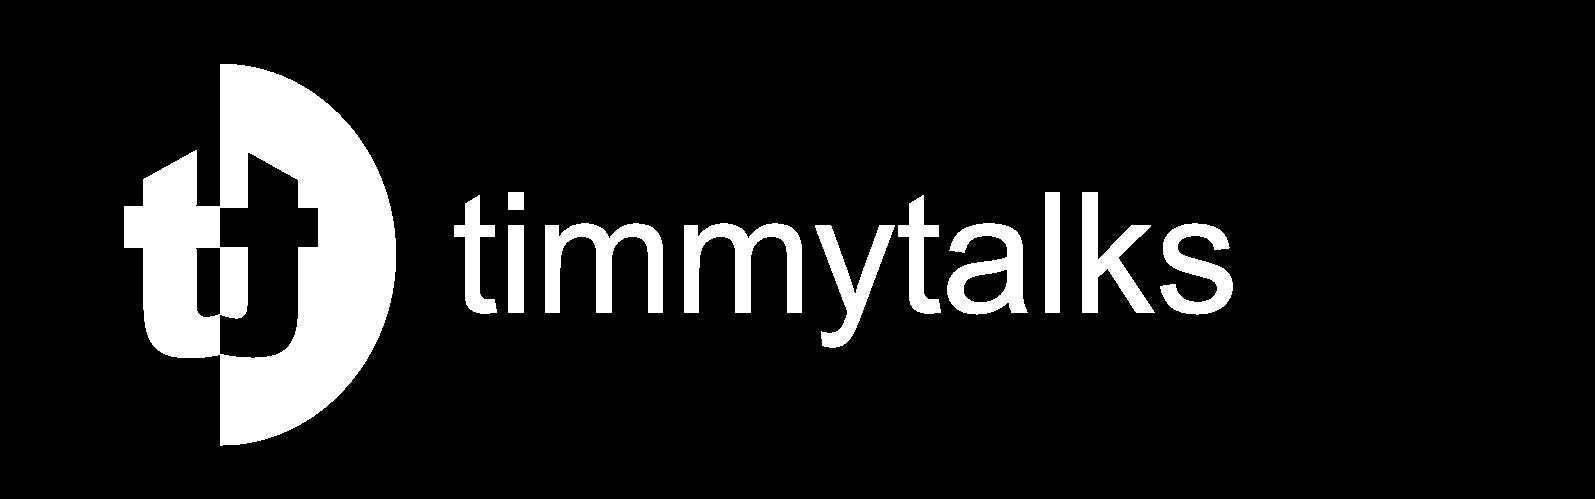 timmytalks